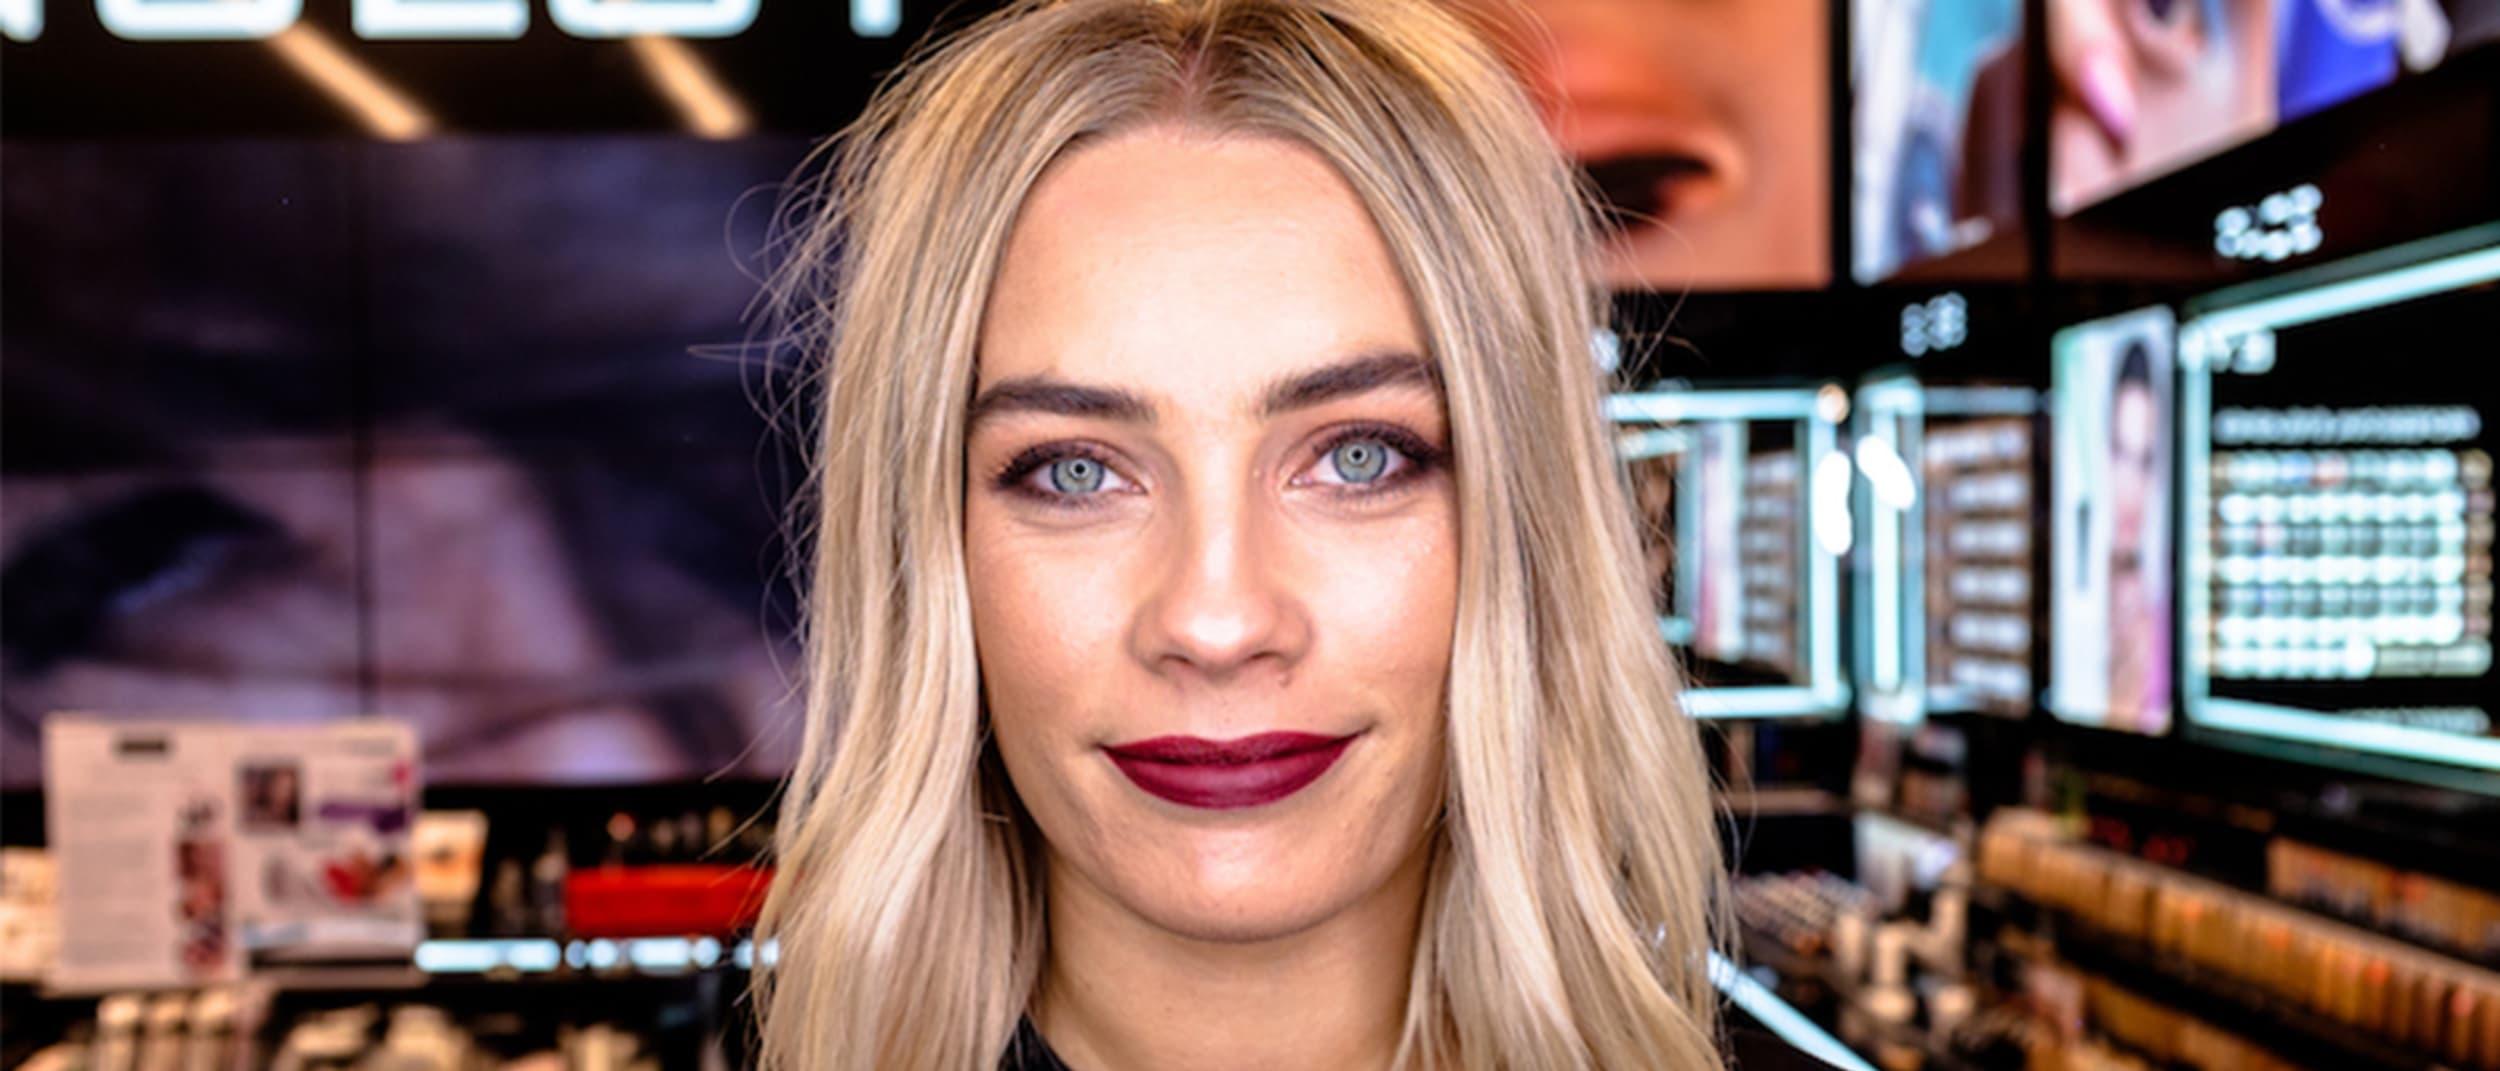 Inglot: divine boardroom to bar makeup in 5 minutes